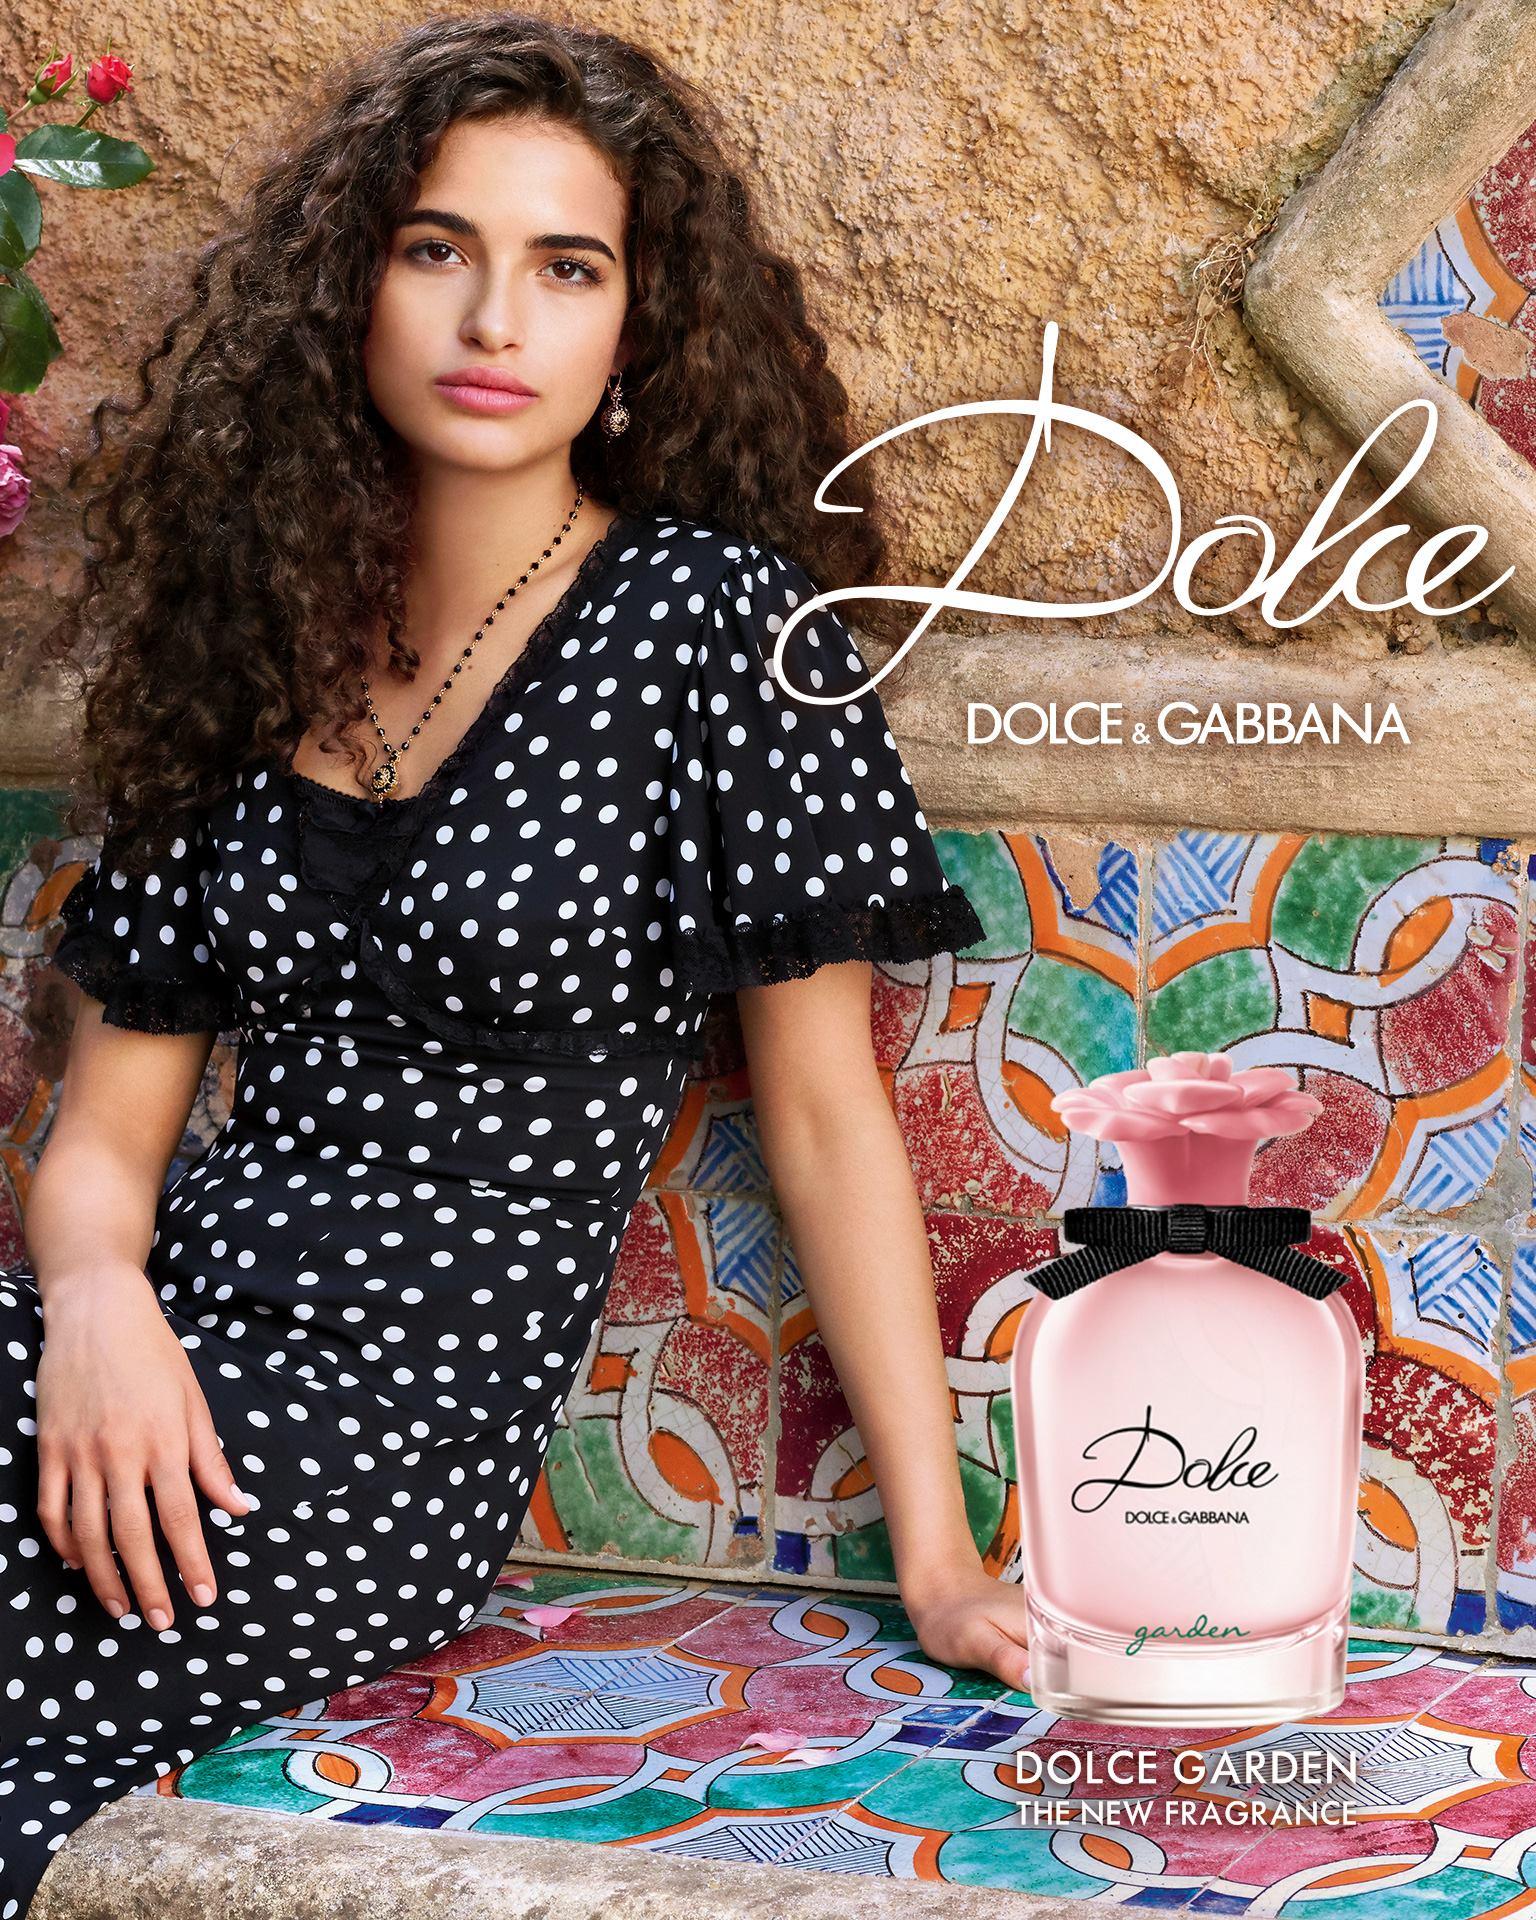 dolce garden eau de parfum shabby chic mania by grazia